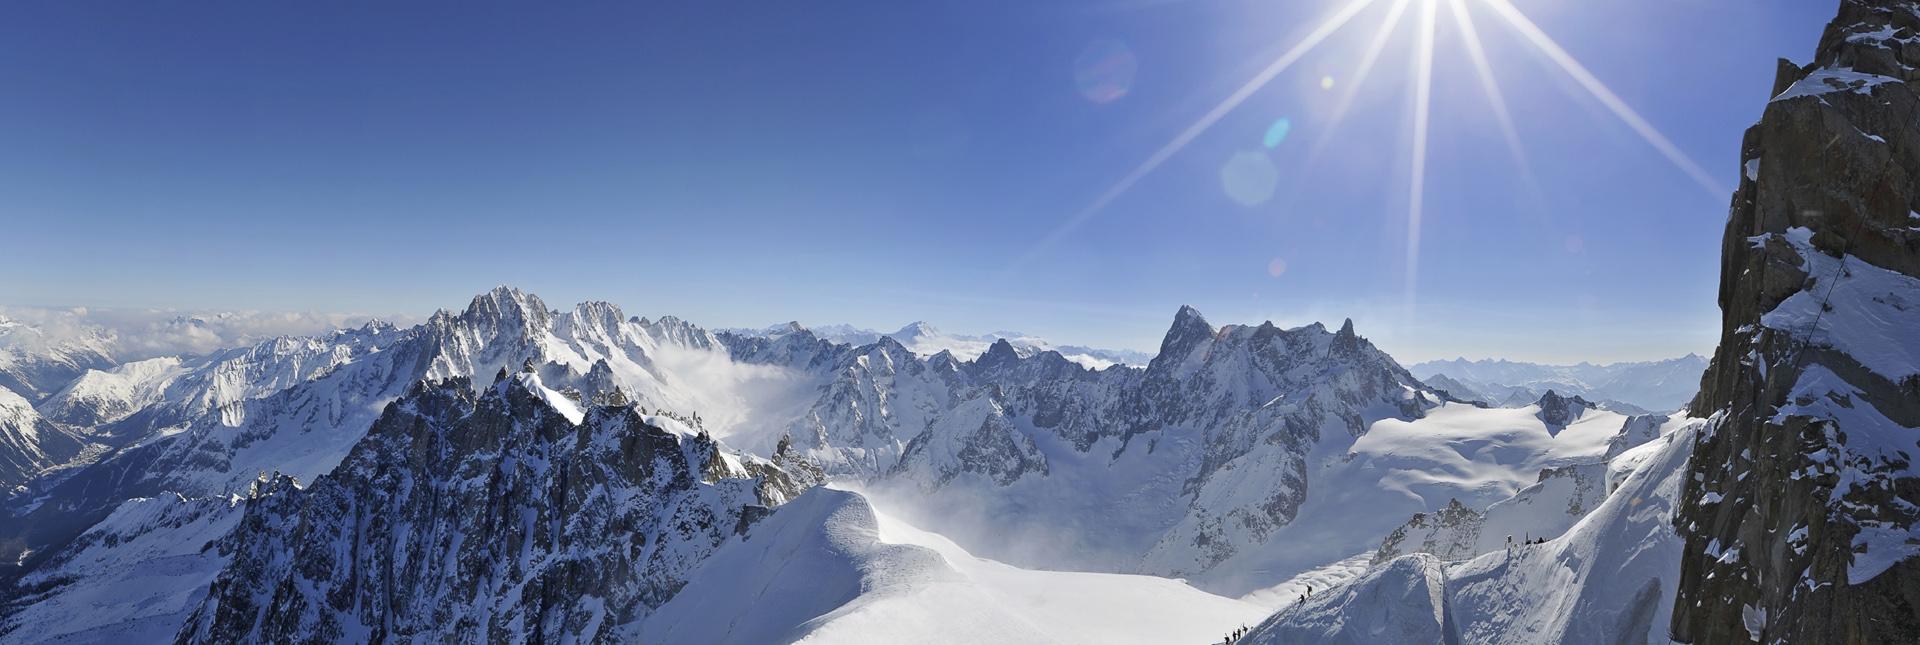 View of Amazing Snow Slopes